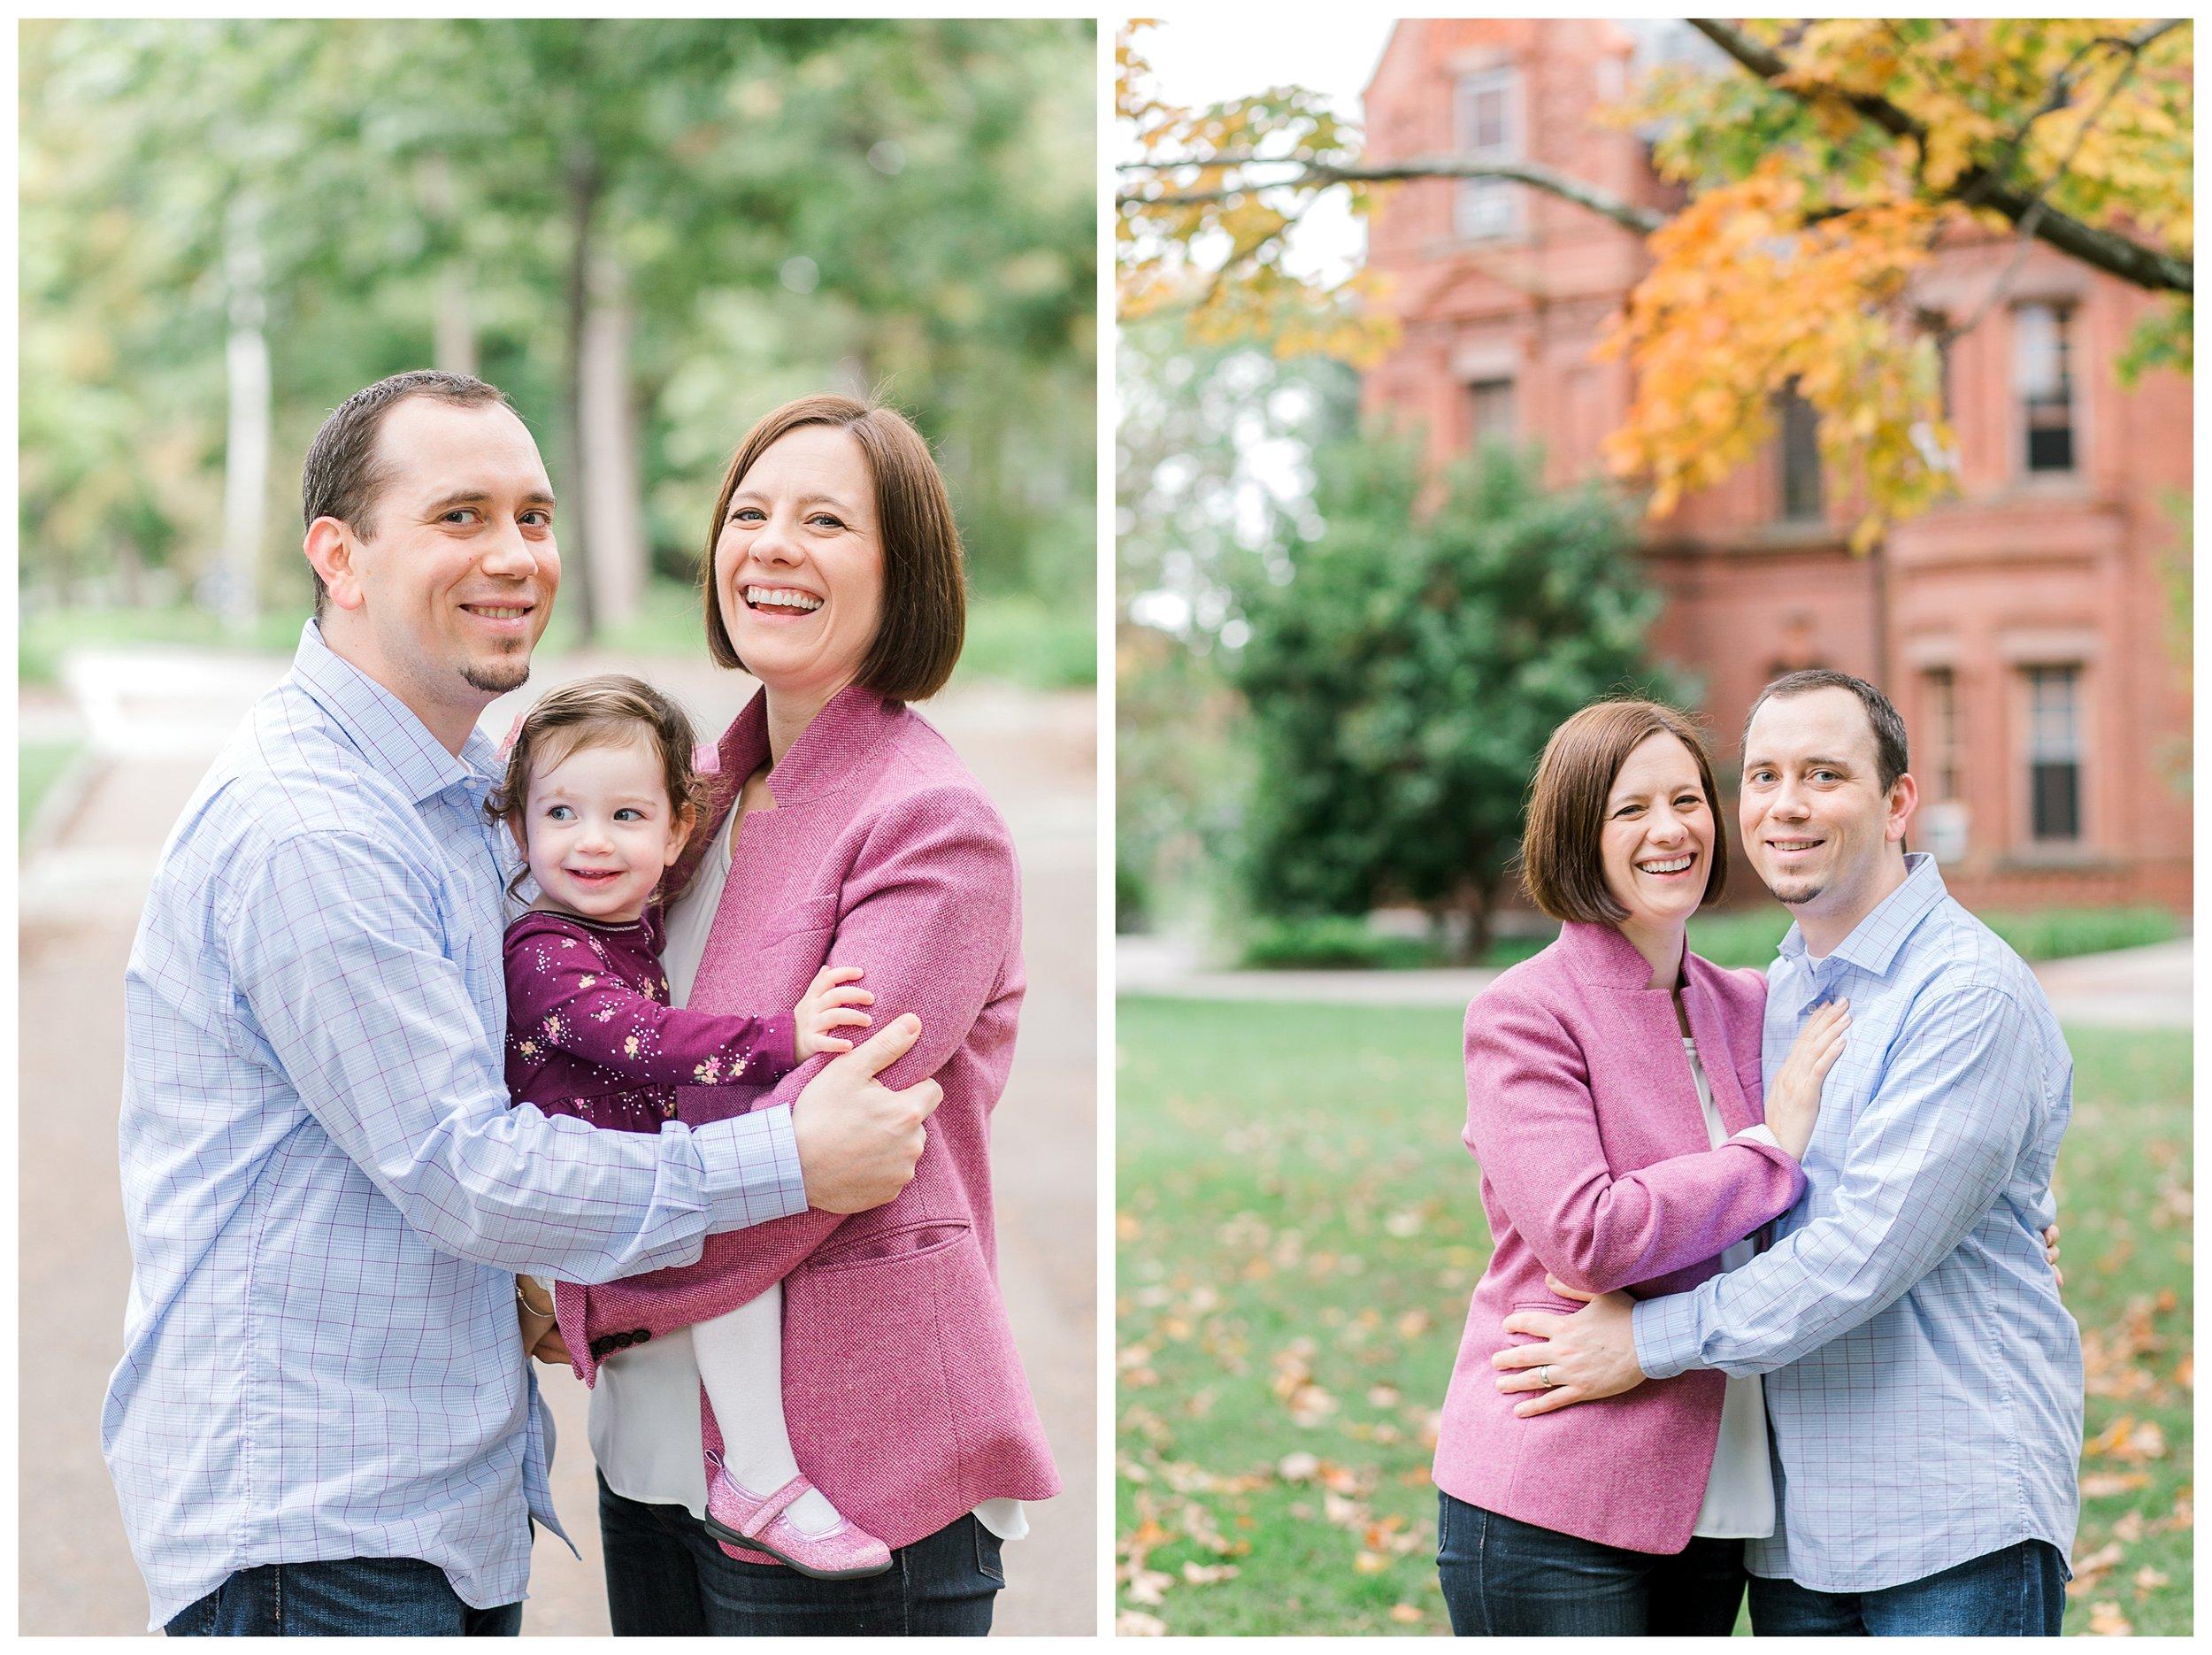 wellesley_family_photographer_erica_pezente_photo  (4).jpg